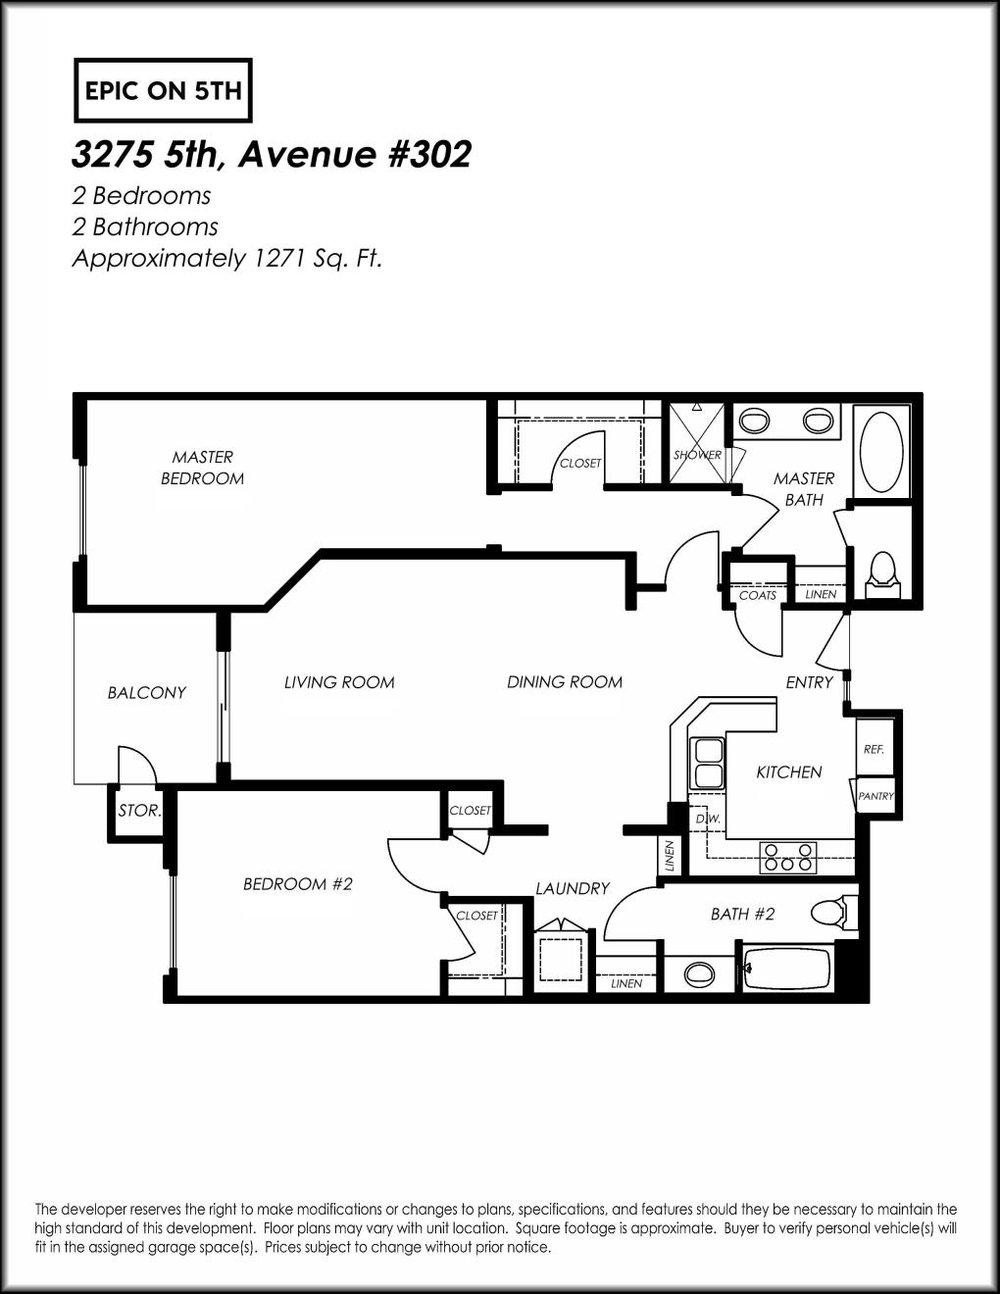 Epic on 5th-Floor Plan 302.jpg